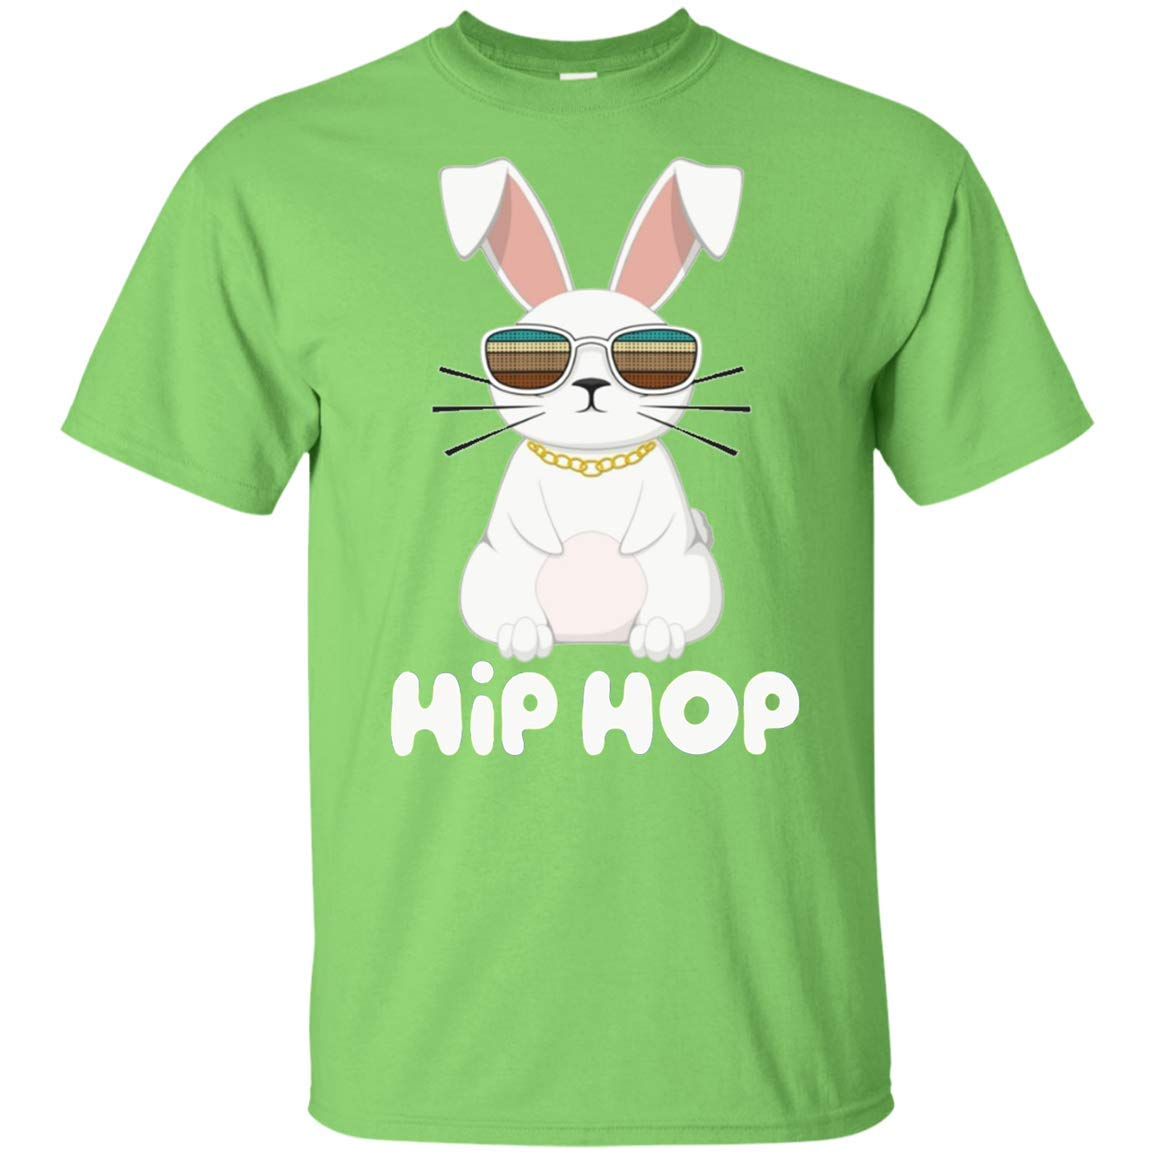 Hip Hop Bunny With Sunglasses Cute Easter Tshirt G200b Ultra Tshirtlimeyl